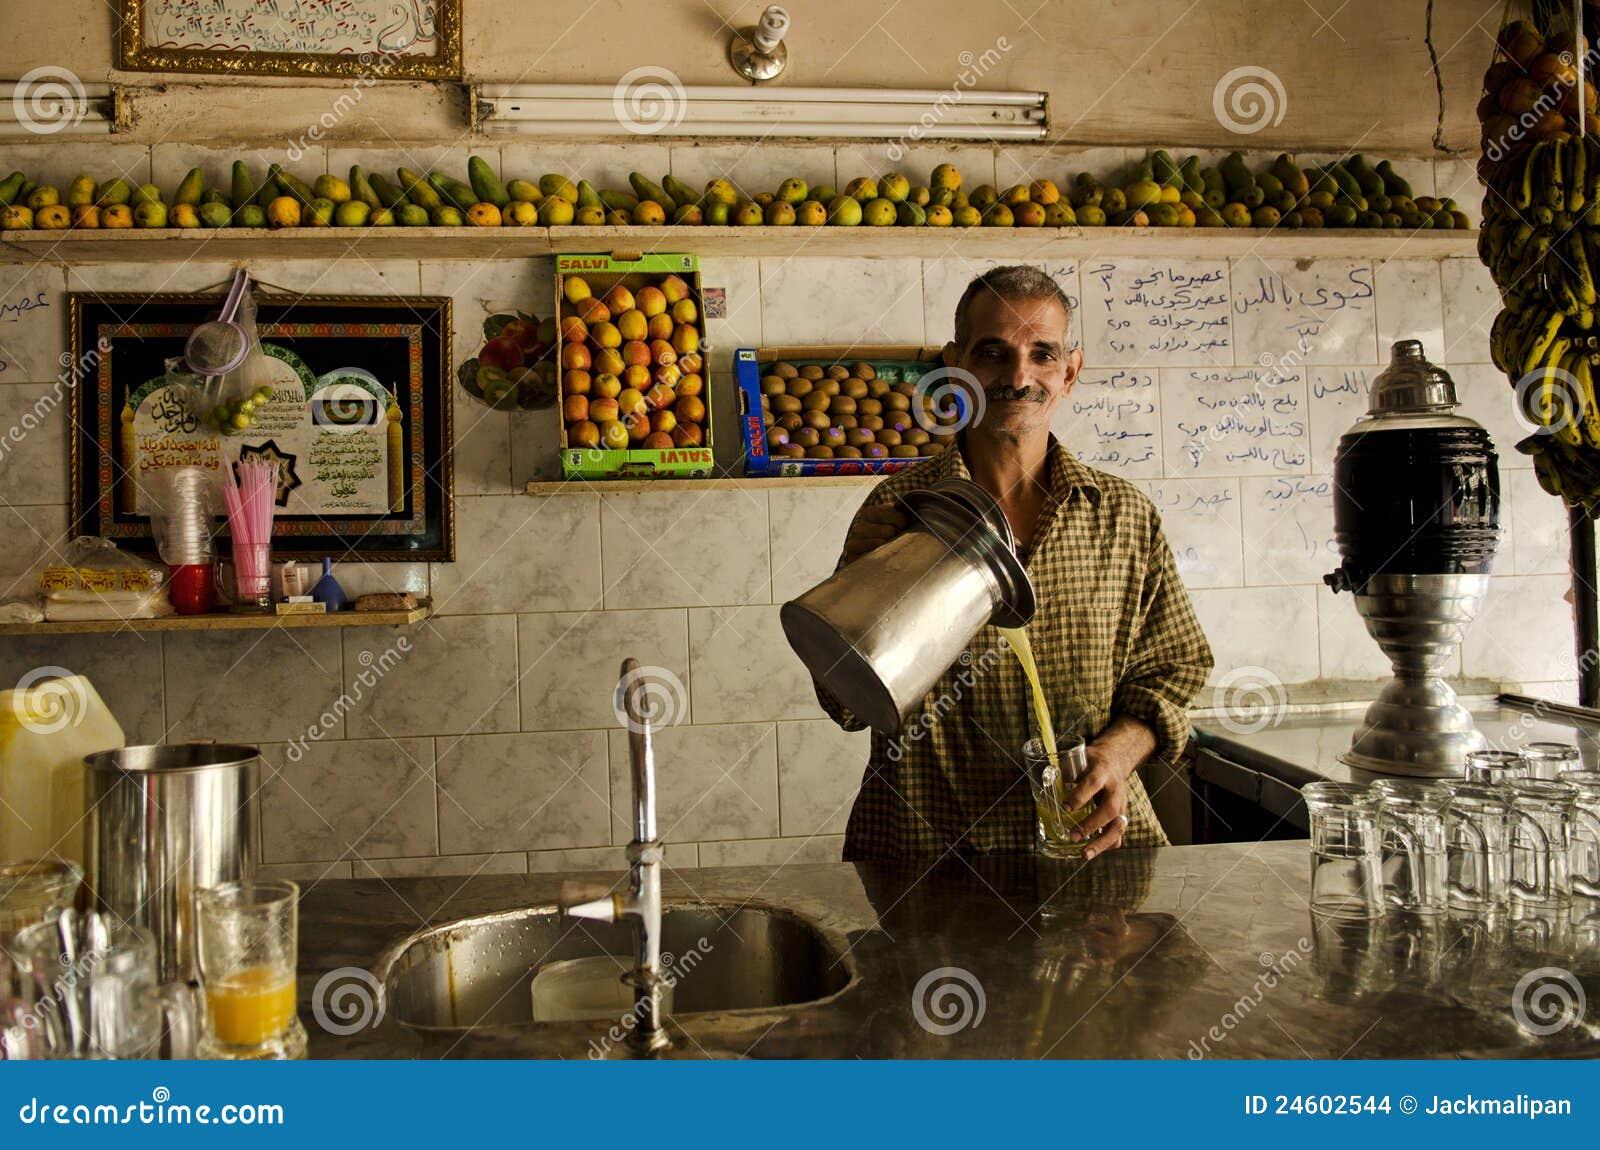 Fruit juice shop in cairo egypt editorial stock image Cairo shop